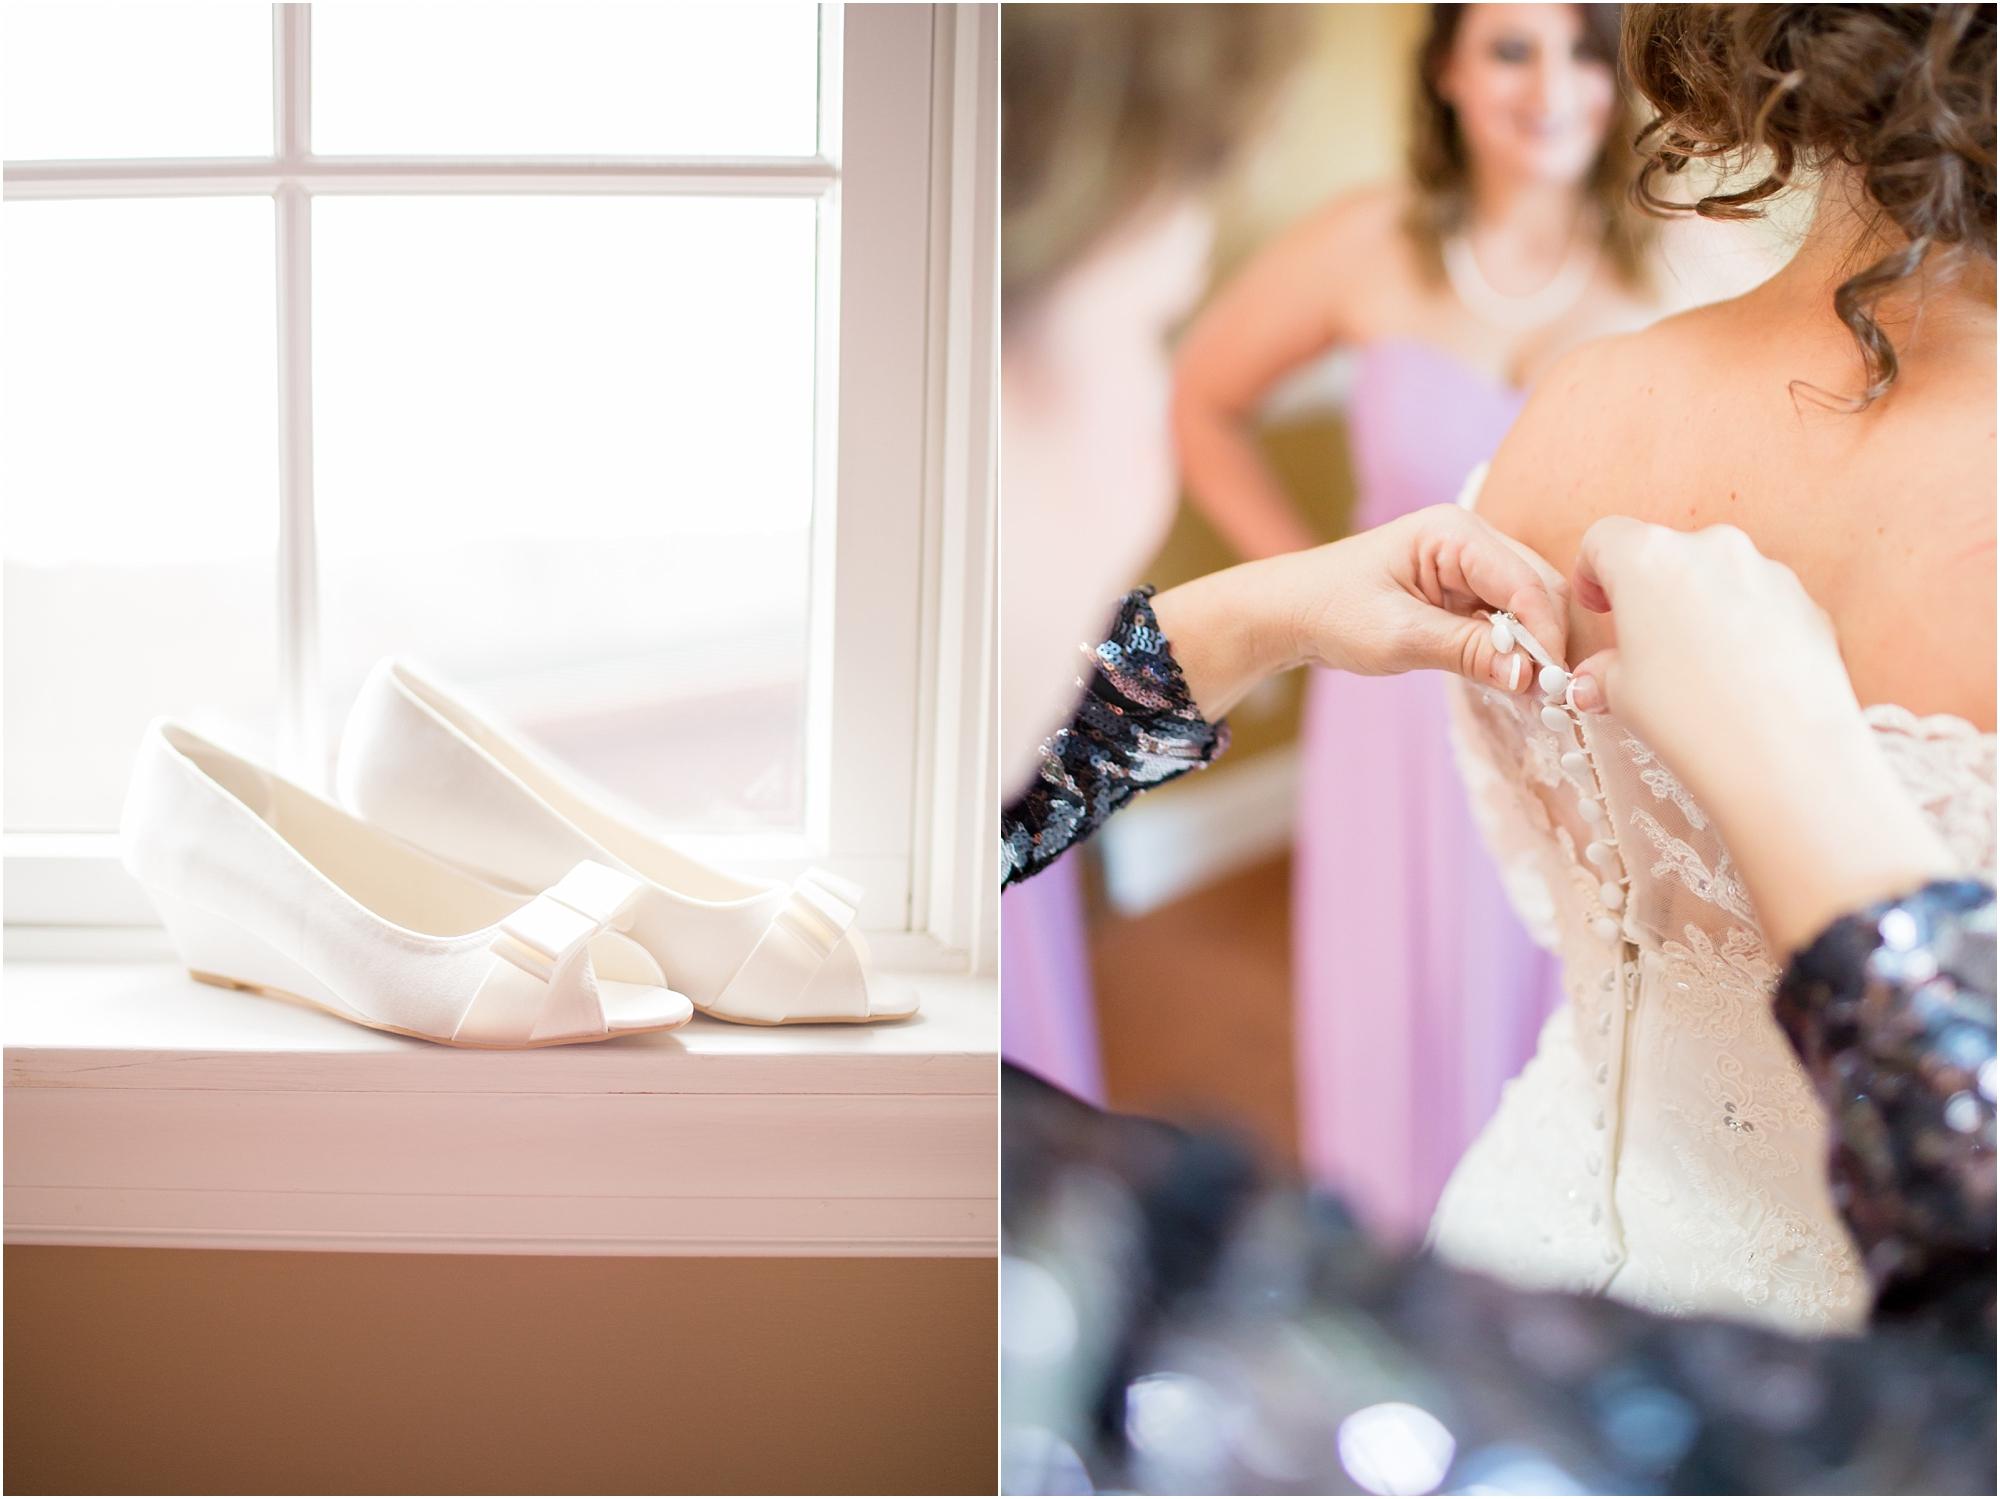 Simpson 1-Getting Ready-291_anna grace photography virginia wedding photographer irvine estate photo.jpg